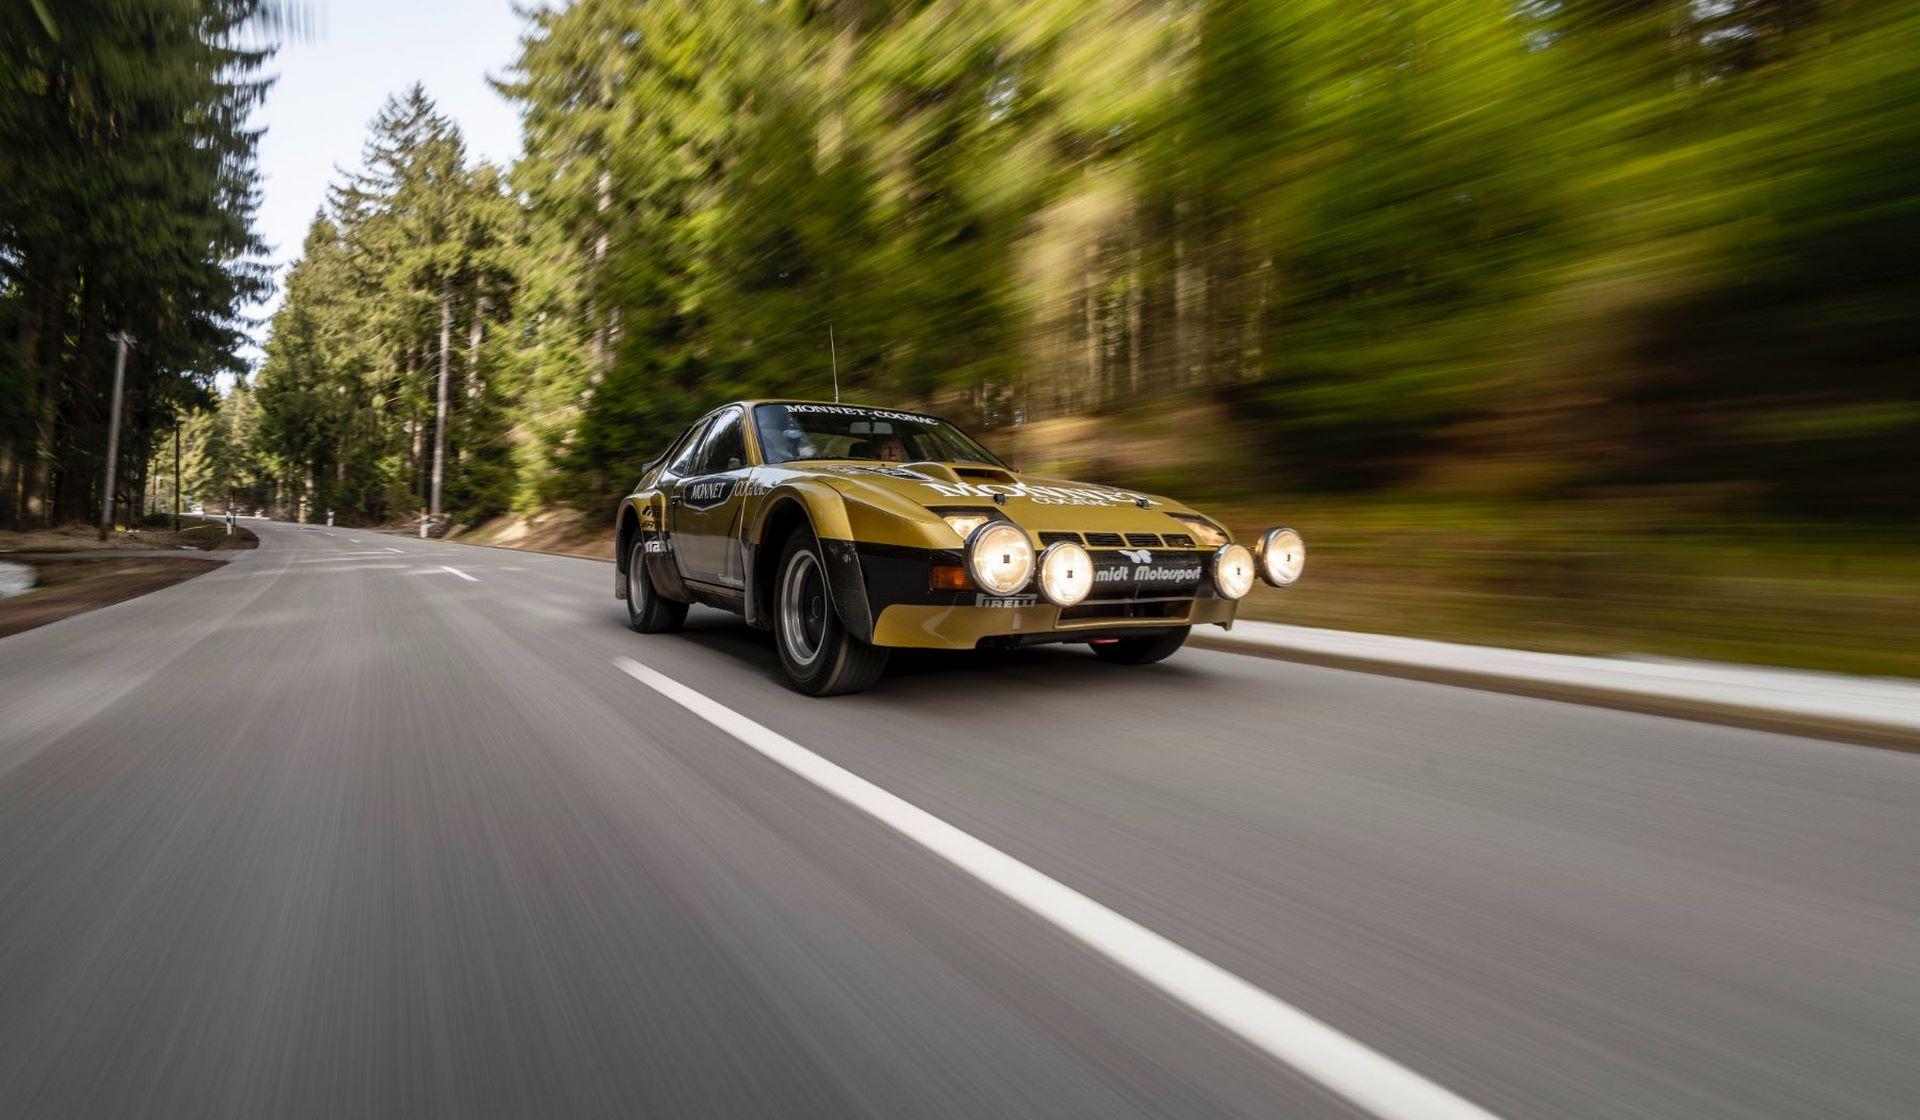 Porsche-924-Carrera-GTS-rally-car-Walter-Rohrl-3